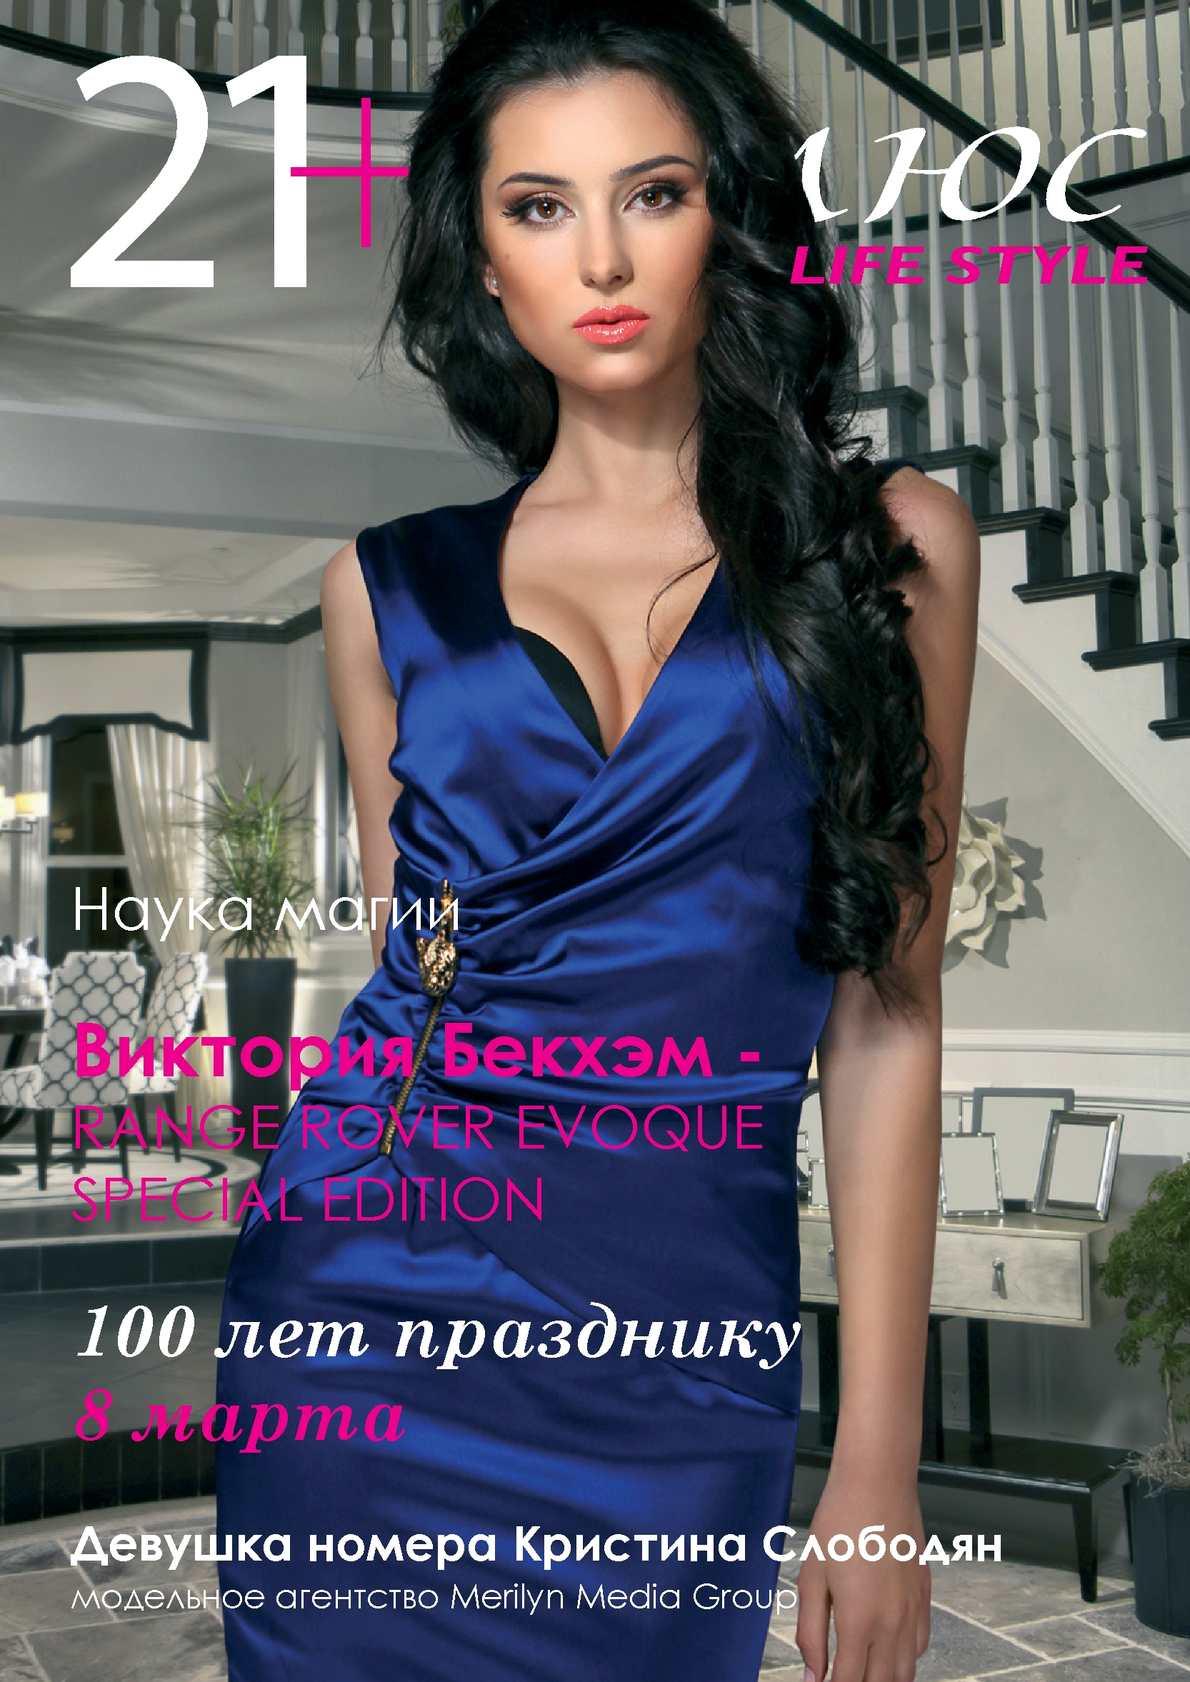 502524a8324 Calaméo - Журнал 21 плюс март-апрель 2013